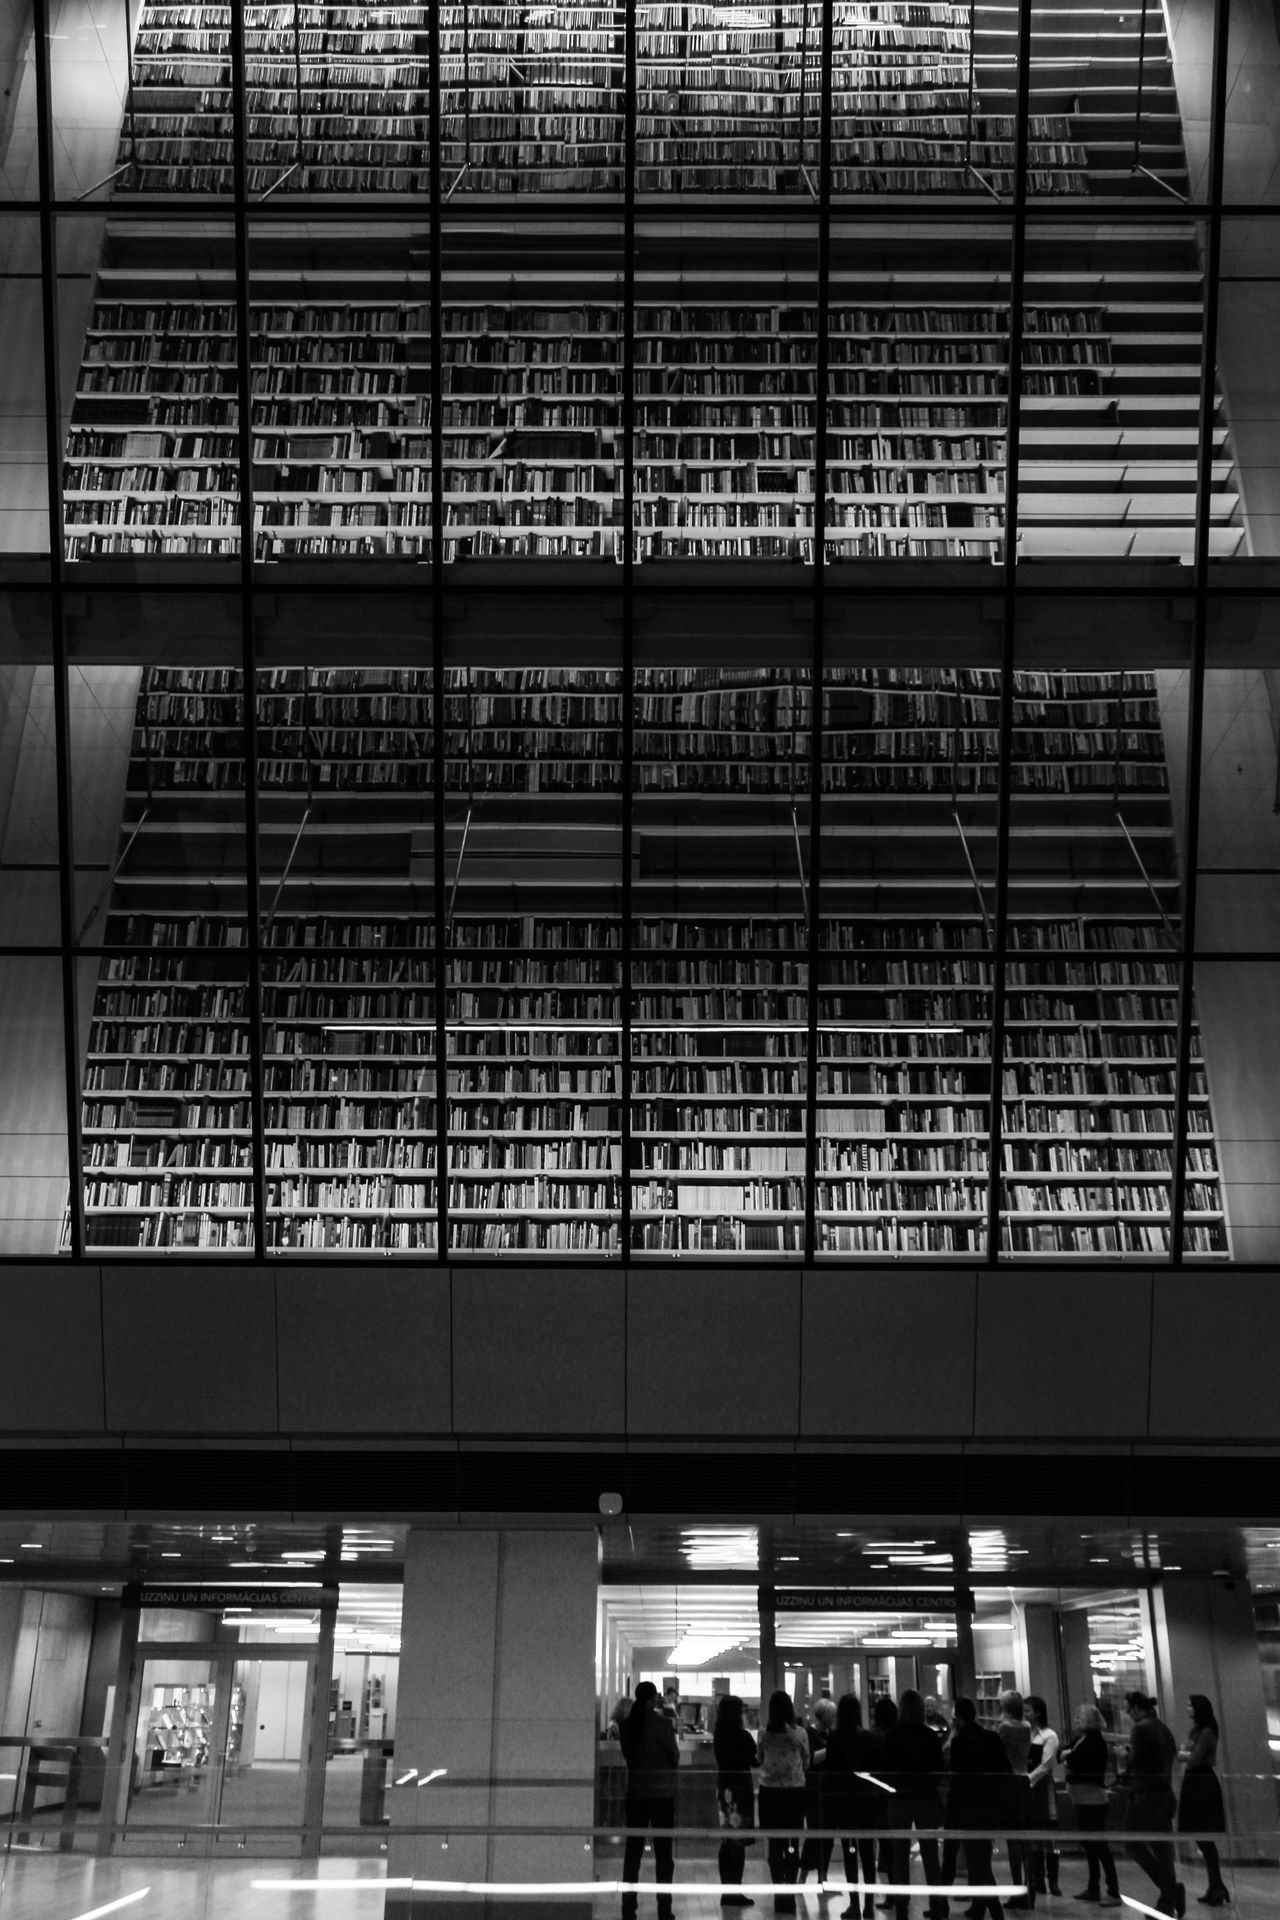 Architecture Boo Book City Design Interior Interior Design Latvia Latvija Library LNB Riga Riga Latvia RigaCity EyeEmNewHere